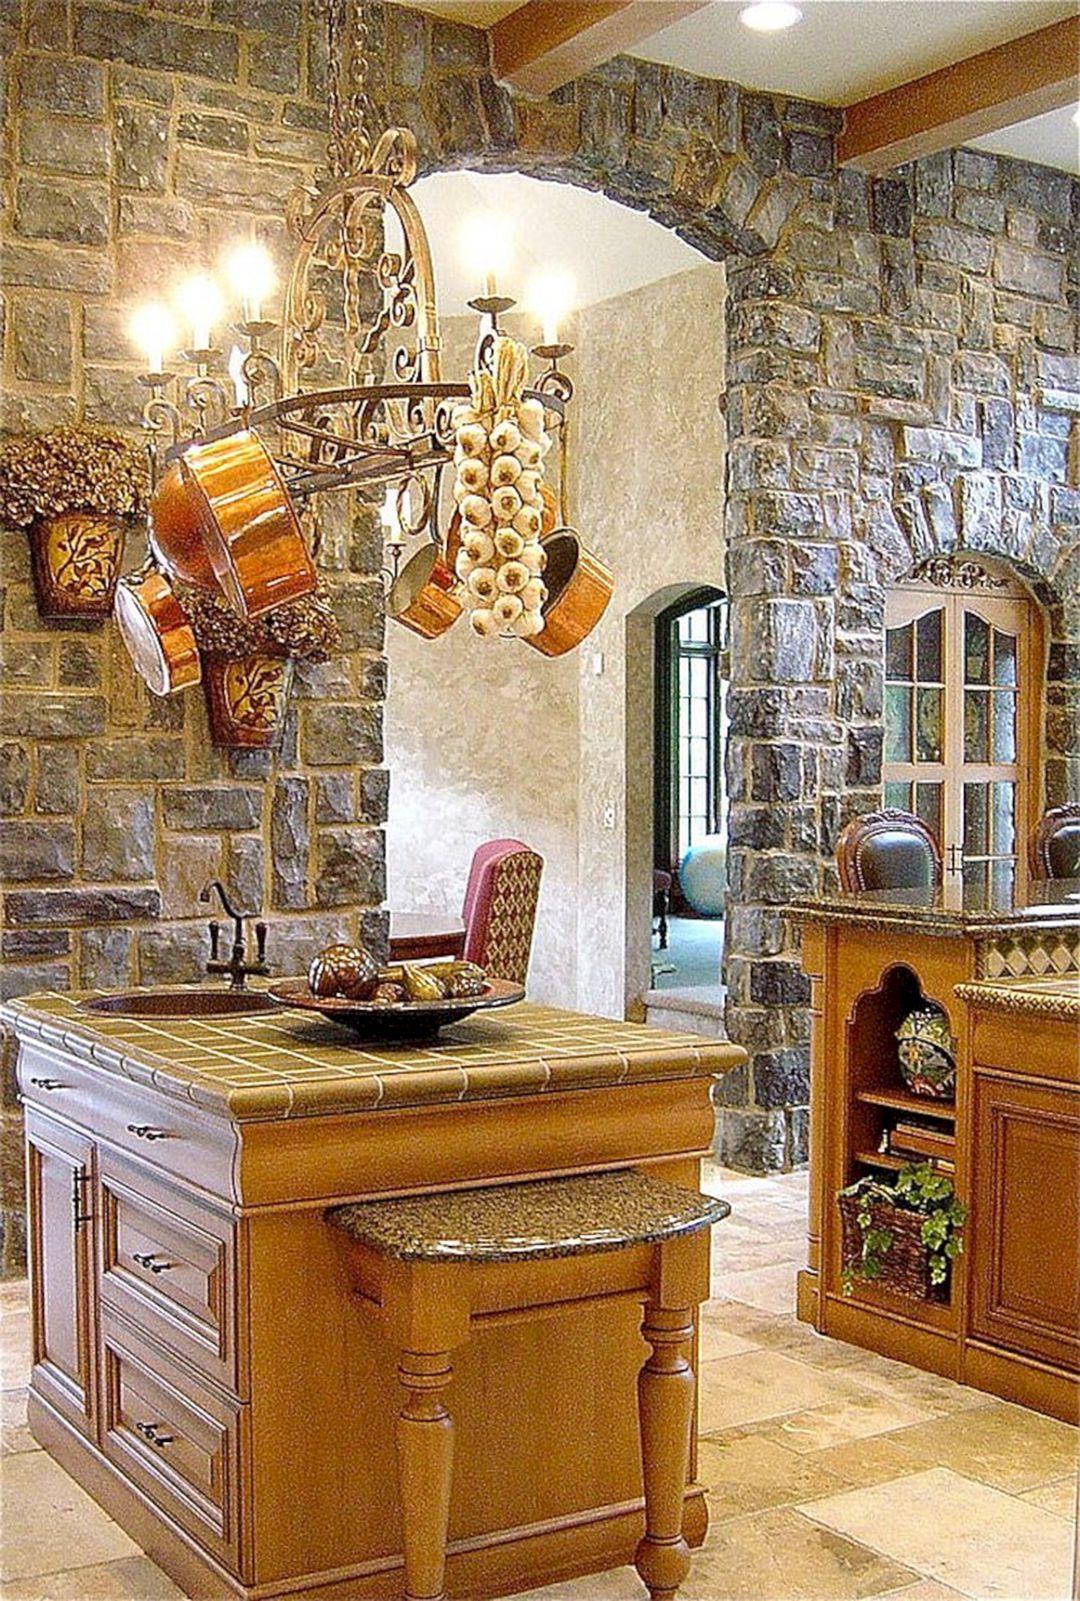 25 extraordinary rock wall design ideas for beautiful on extraordinary kitchen remodel ideas id=74570